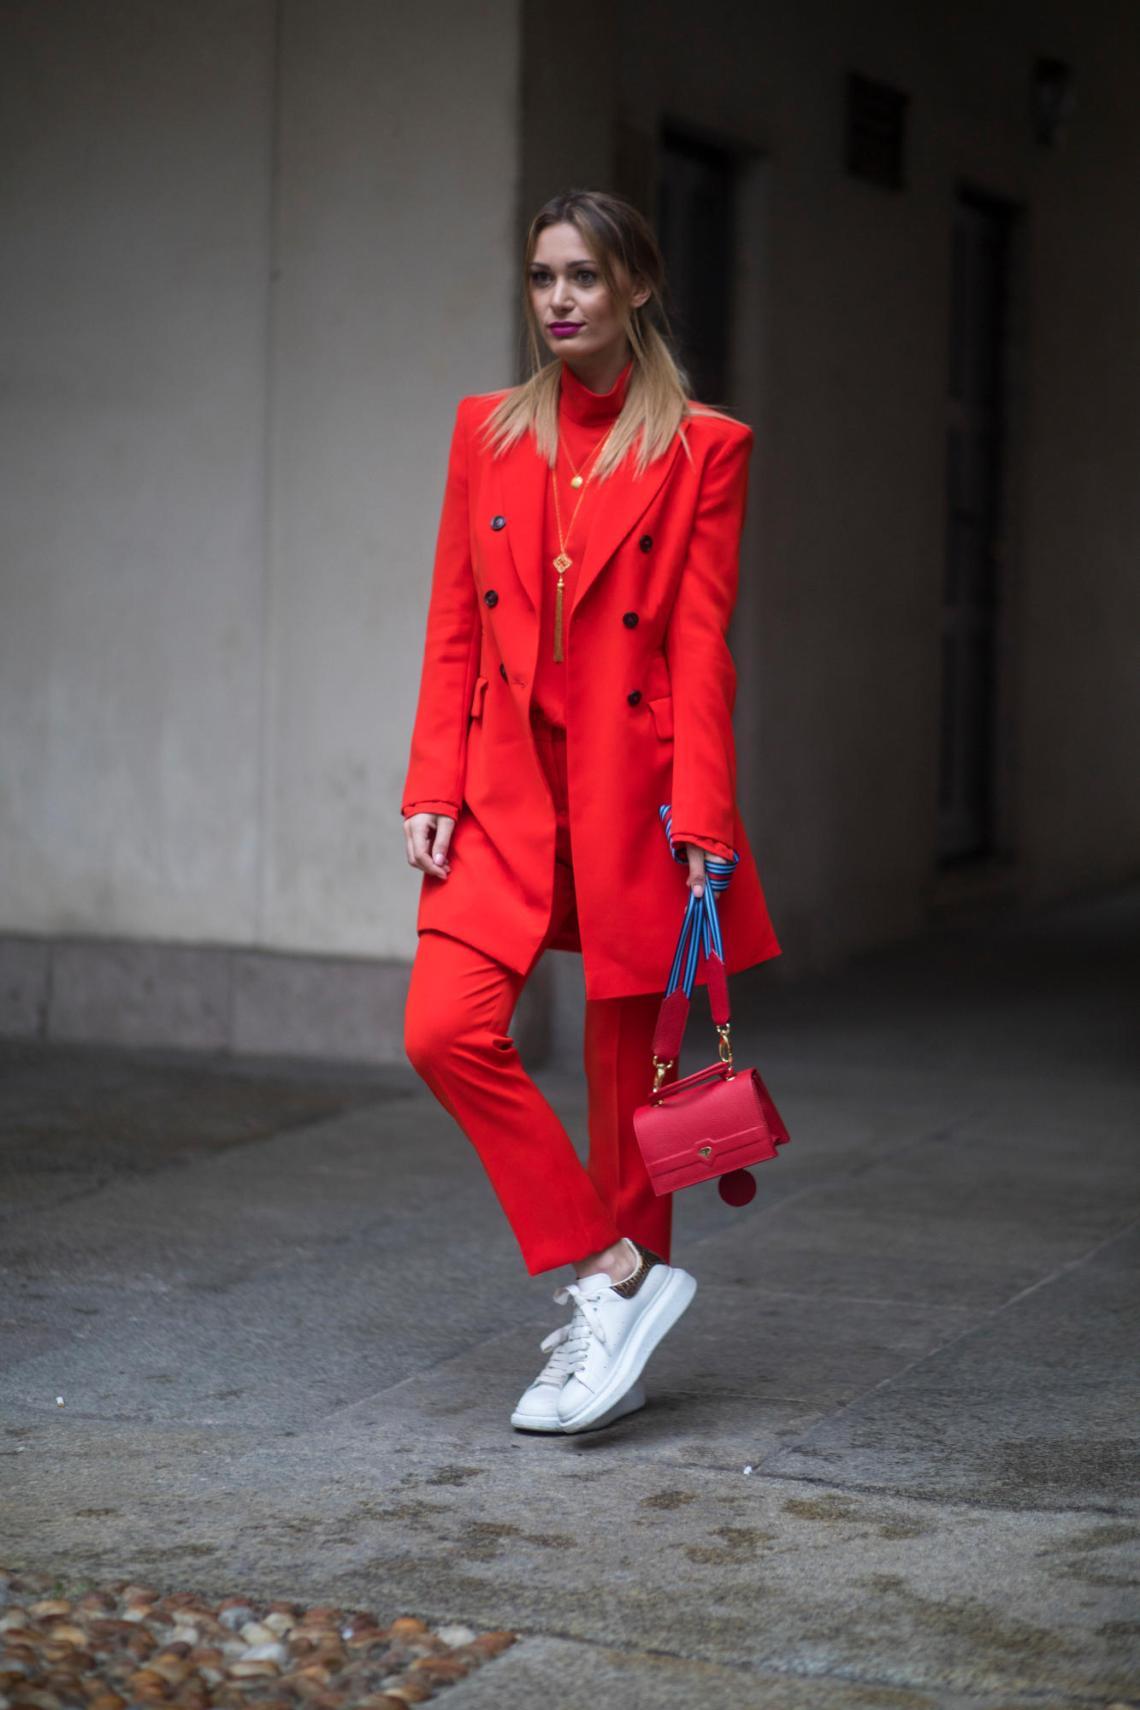 milan-fashion-week-street-style-fall-2018-day-2-20